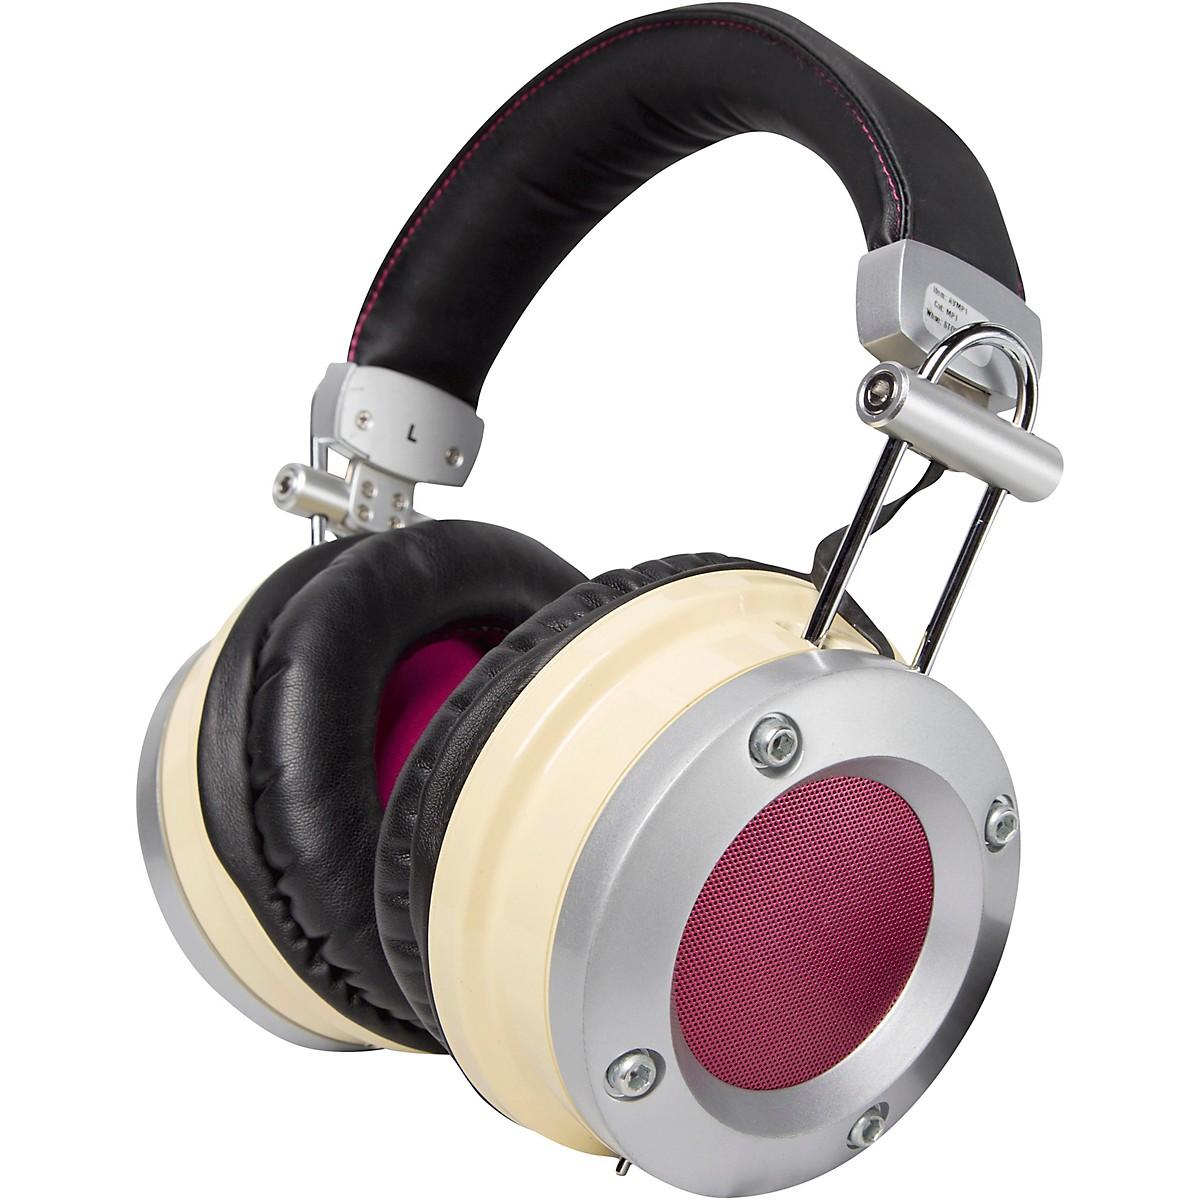 Avantone Multi-mode reference headphones with Vari-Vo